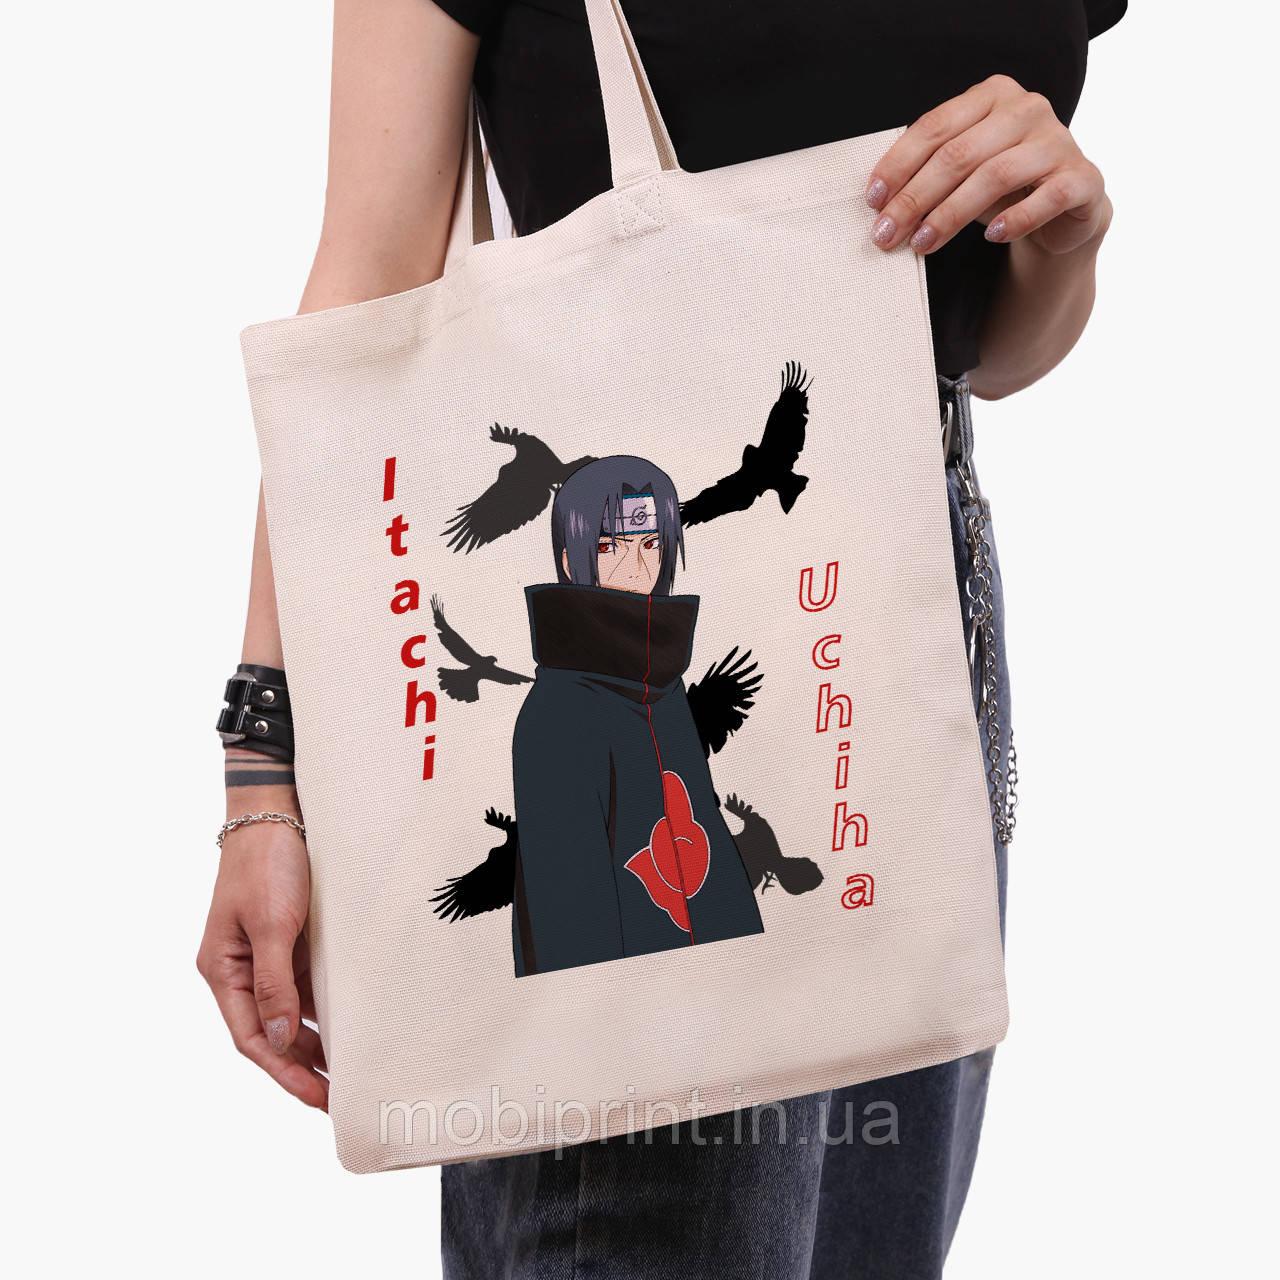 Эко сумка шоппер Итачи Учиха (Itachi Uchiha) (9227-2821)  41*35 см